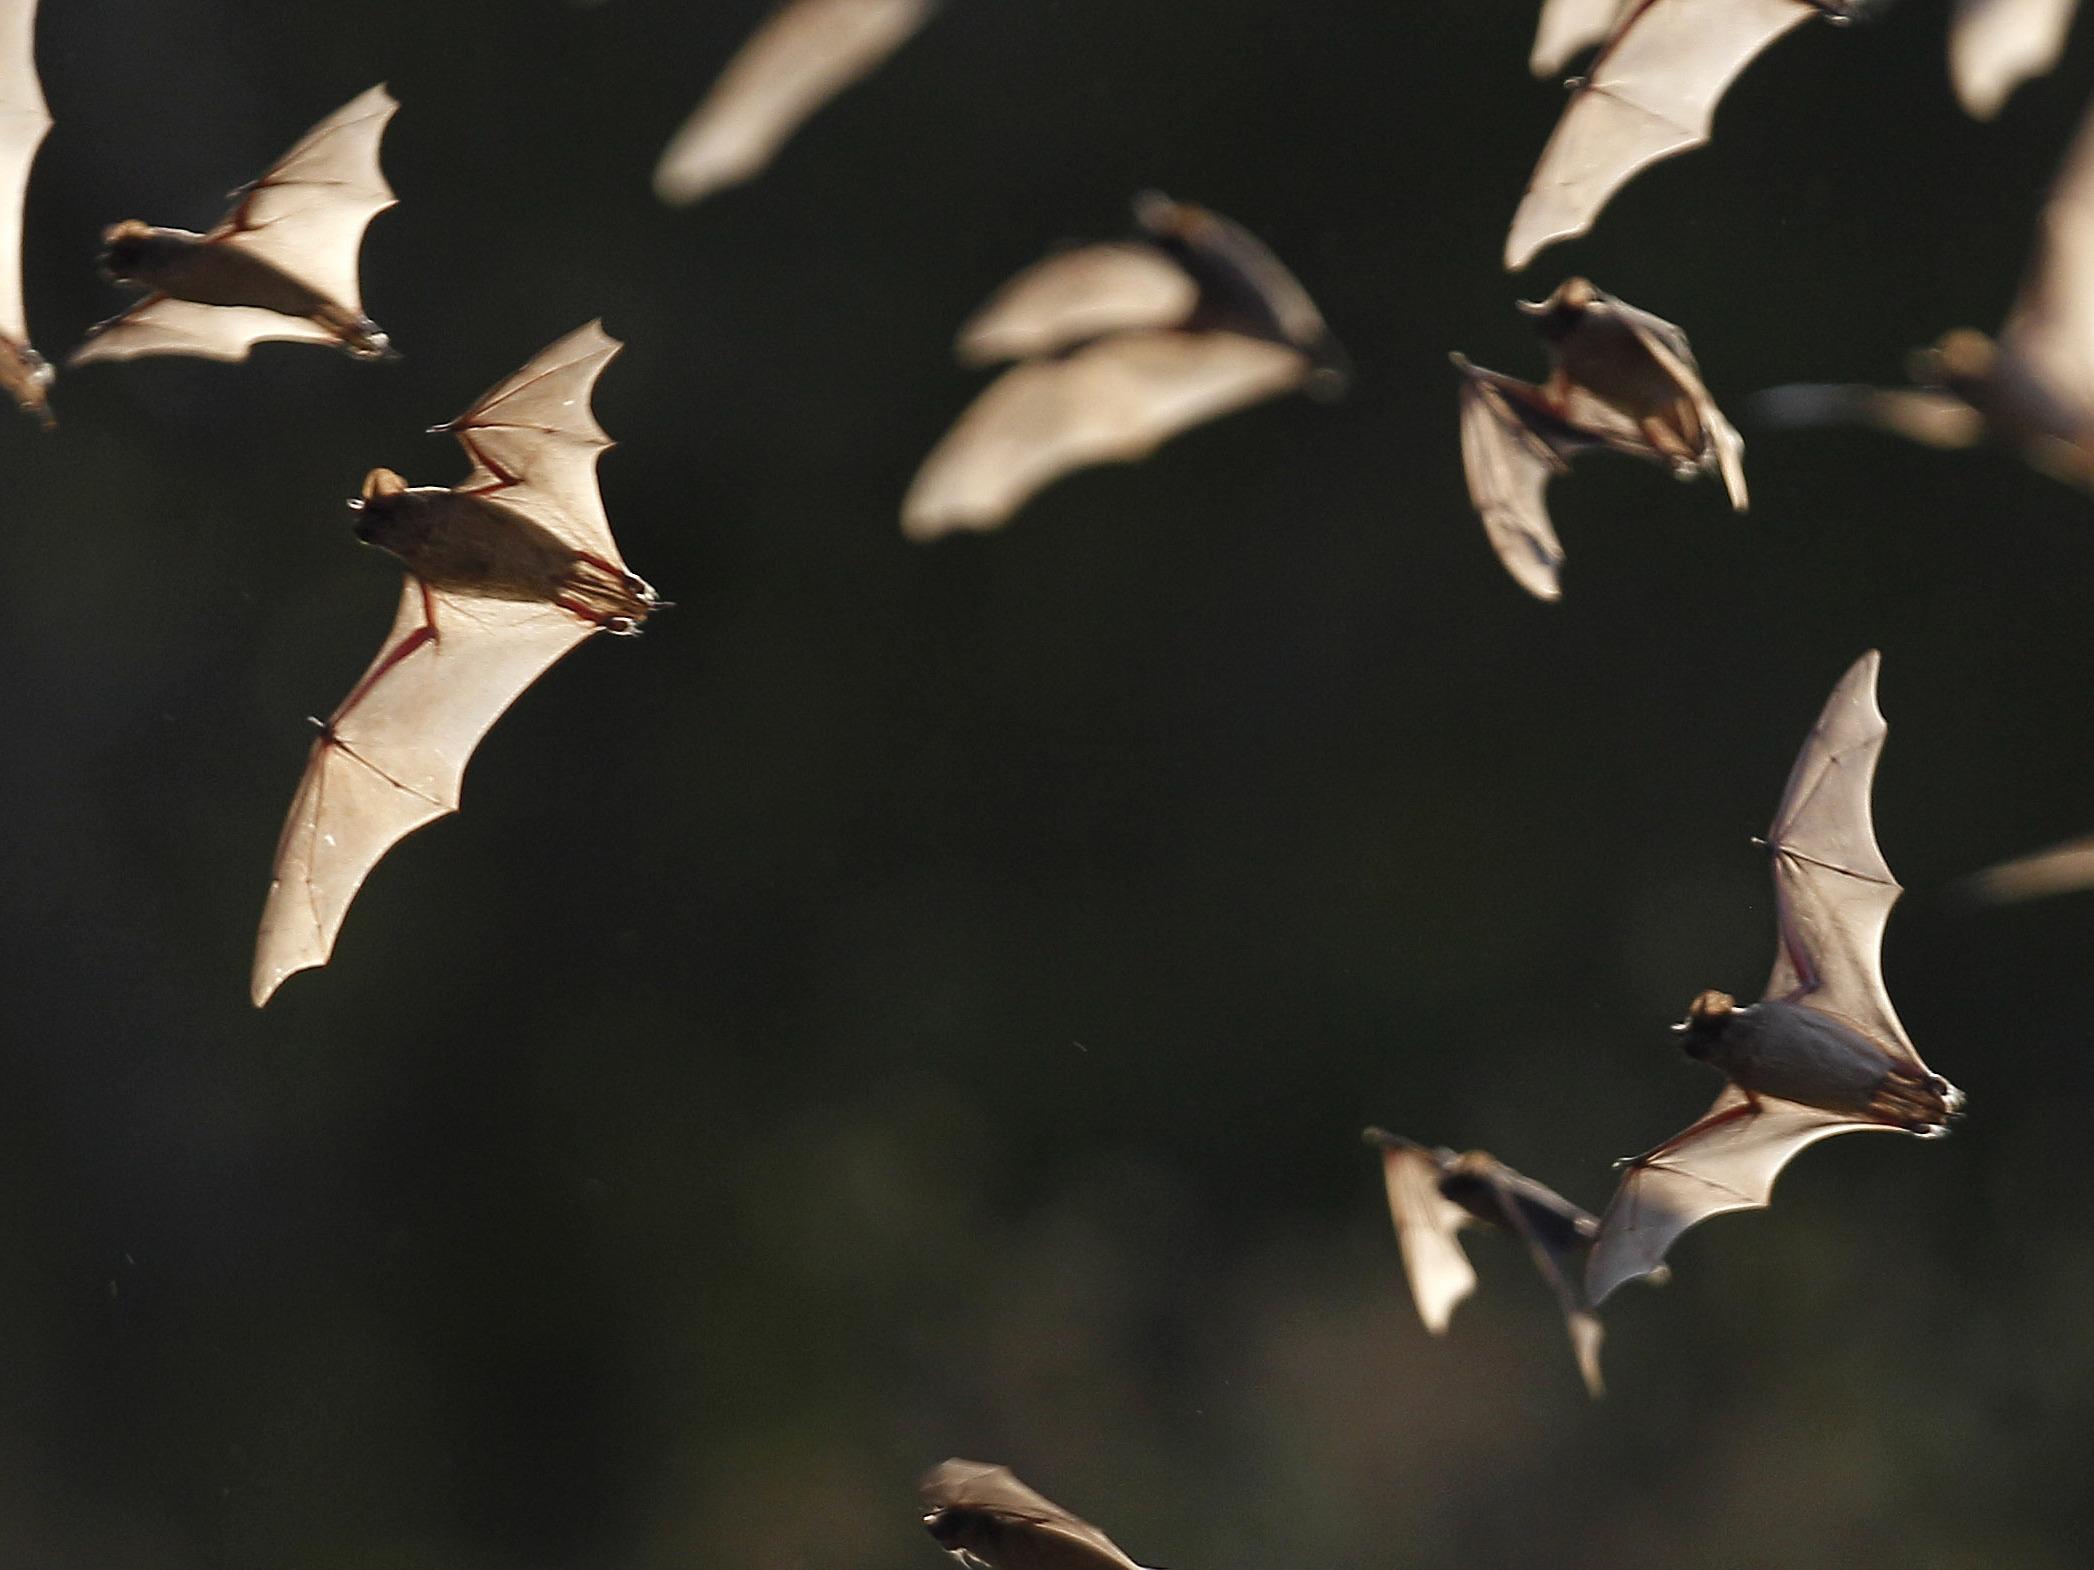 Massive Bat Cave Stirs Texas Size Debate Over Development